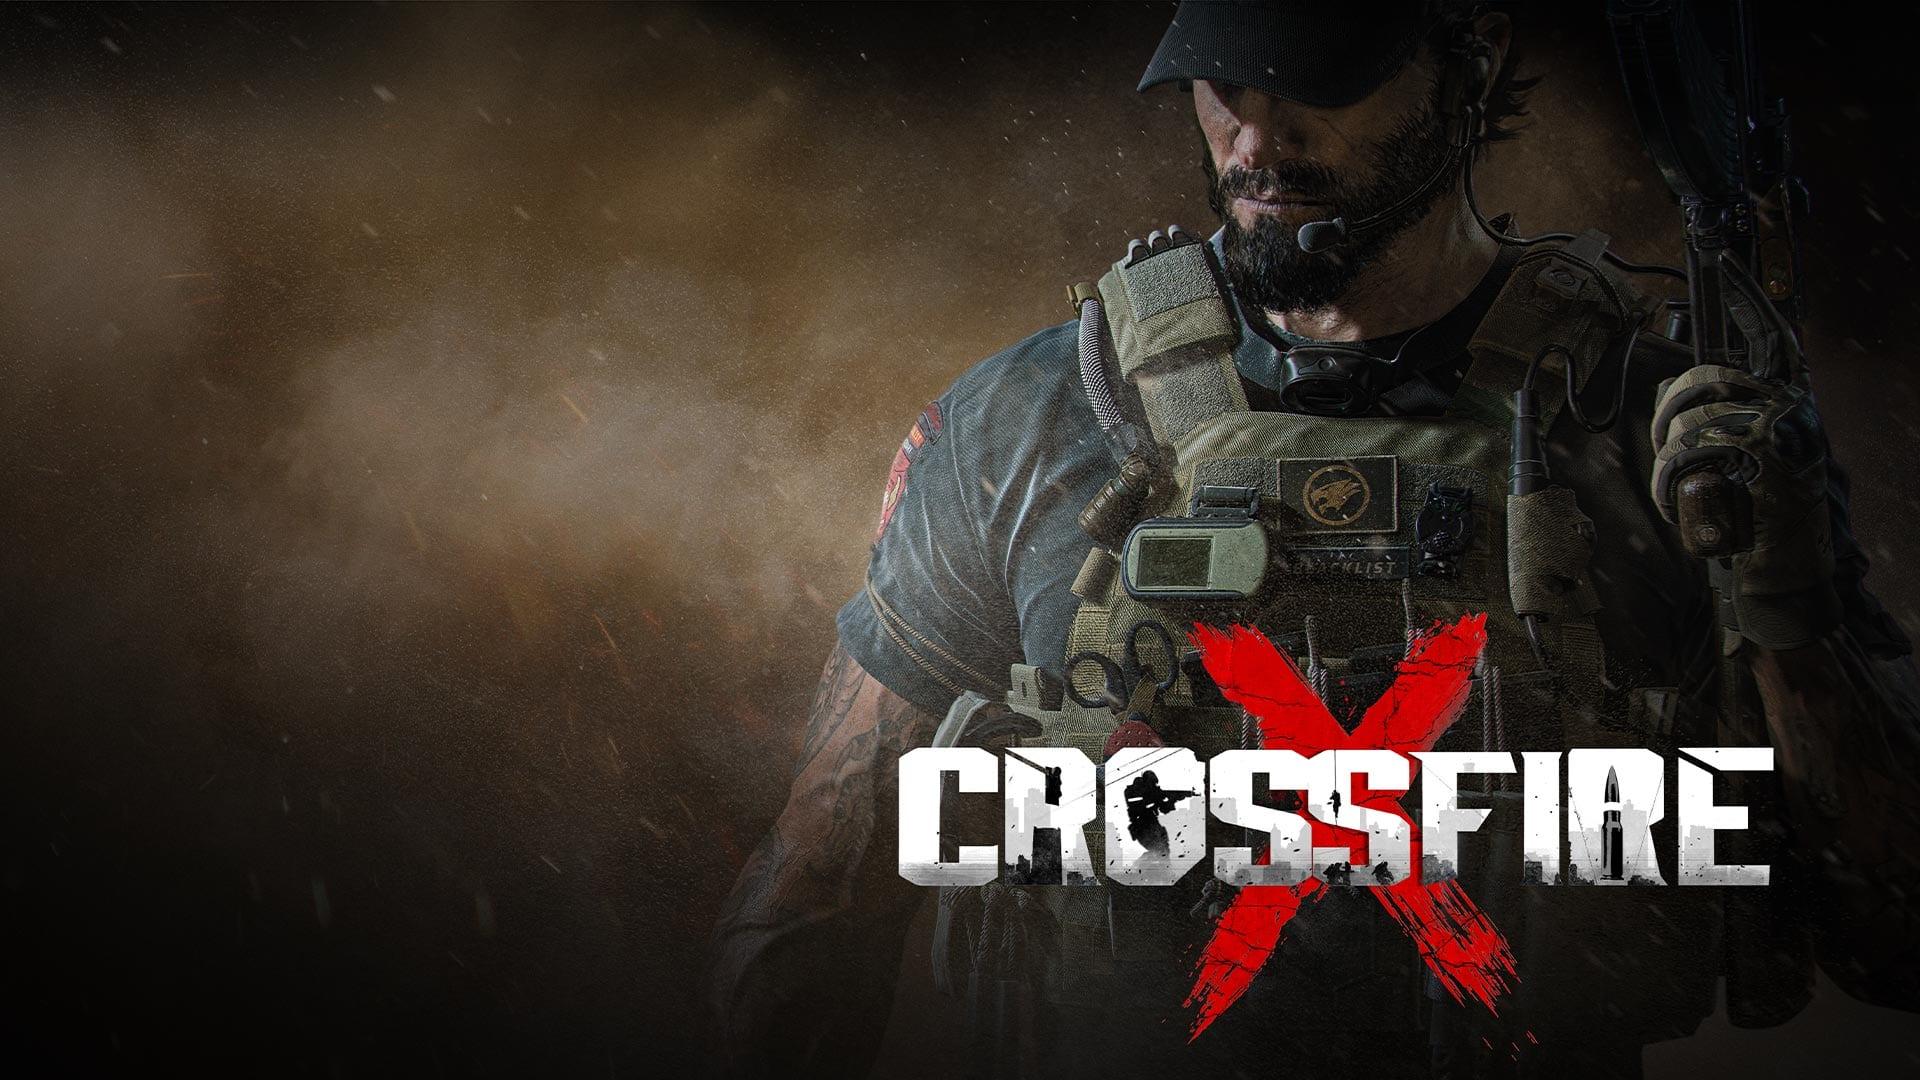 CrossfireX Xbox Games Showcase